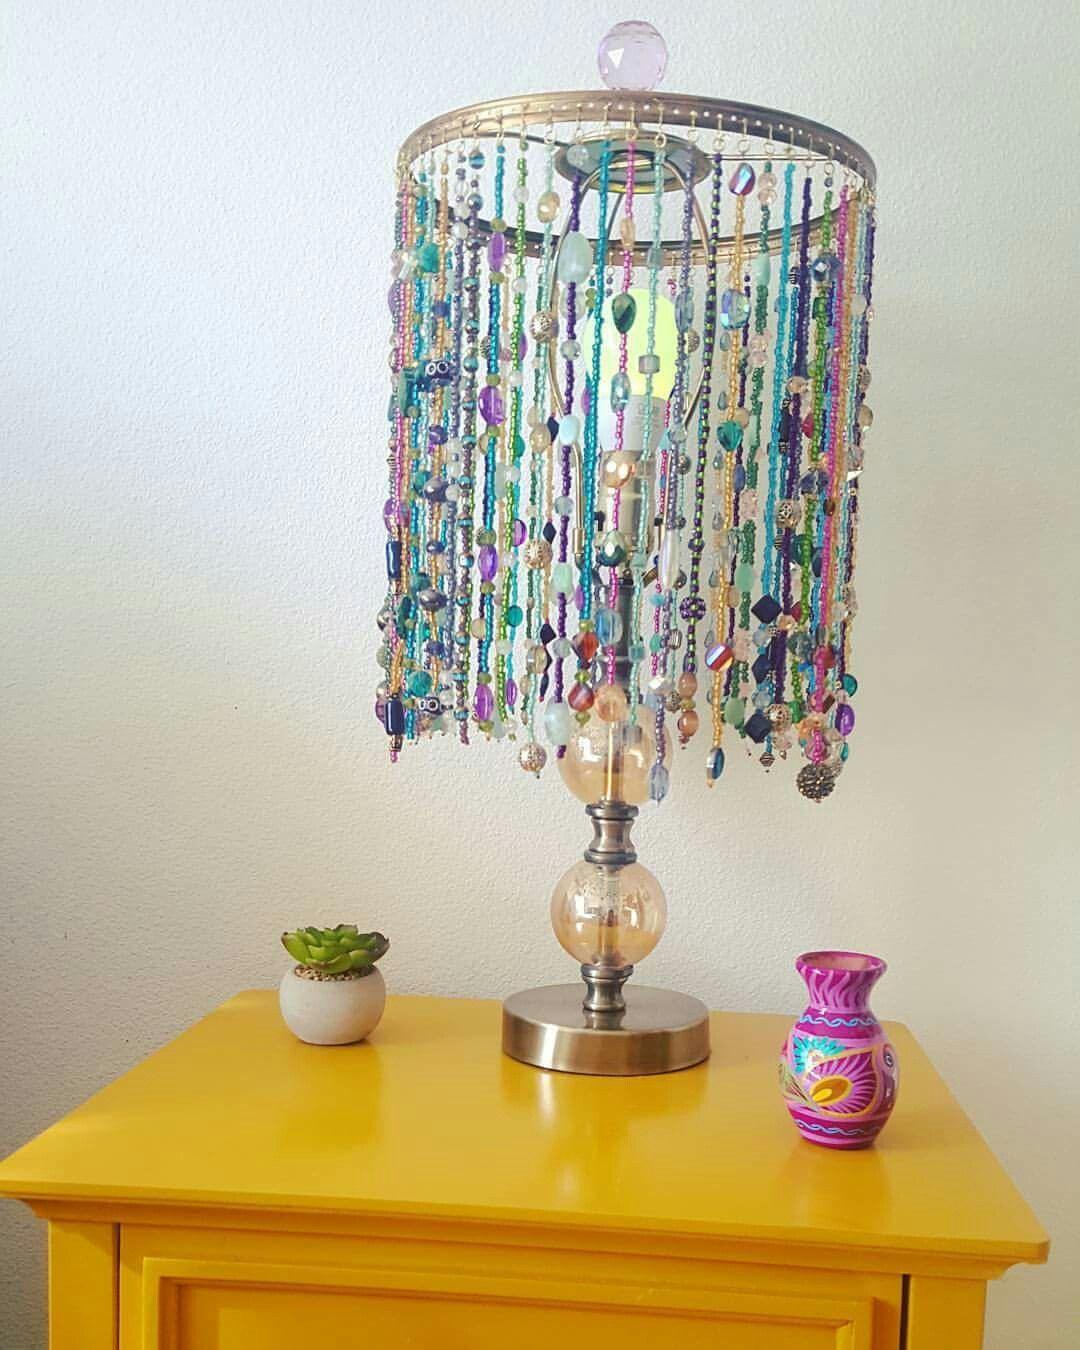 Diy Beaded Lampshade Uh Huh Pinterest Diy Curtains Lamp